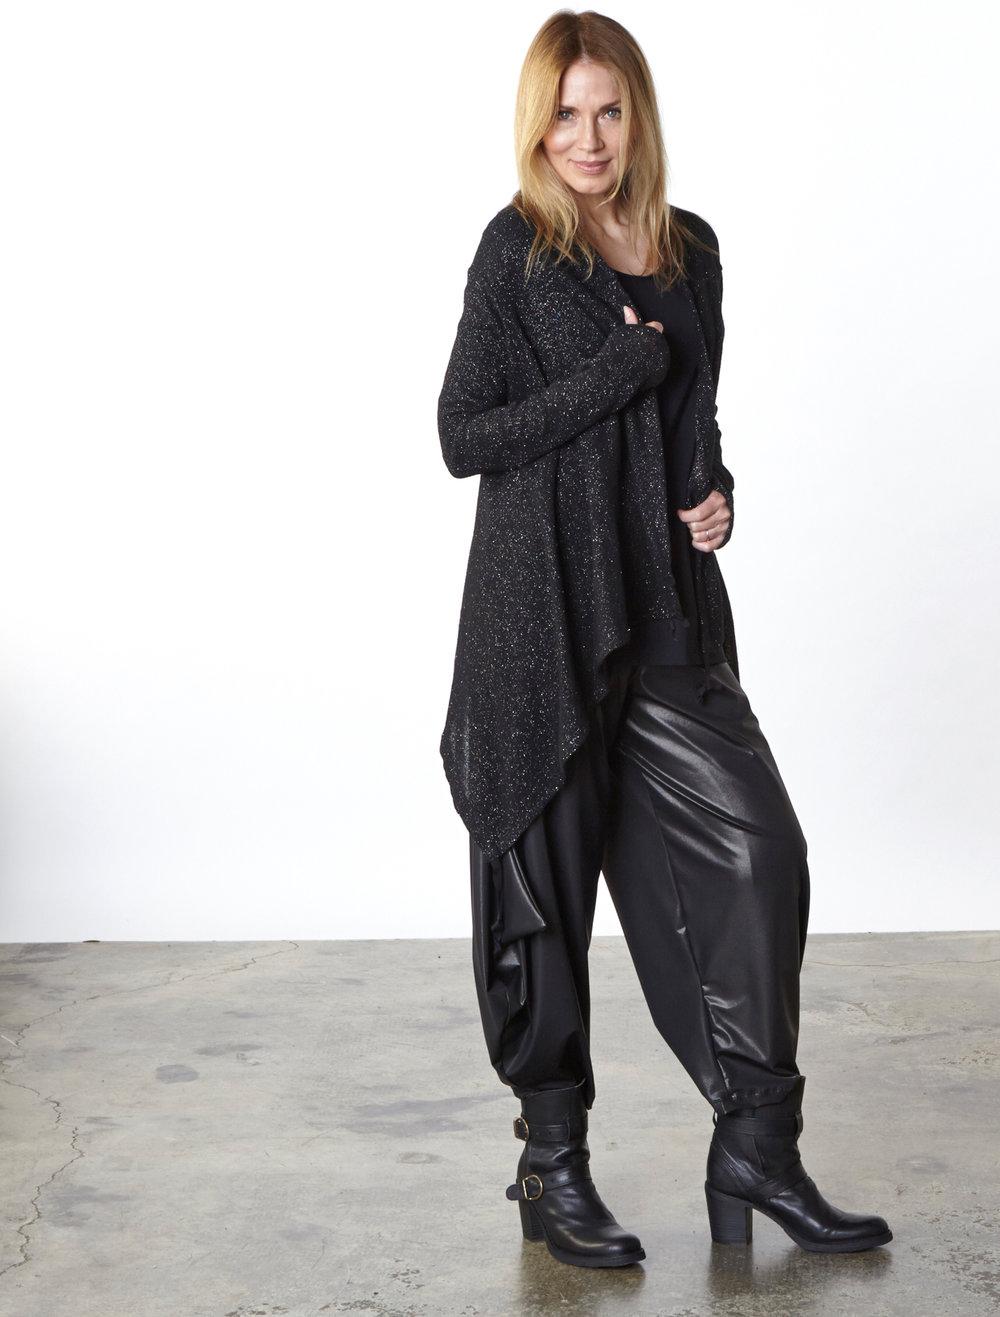 Eva Cardigan in Black Italian Sparkle Wool, Gabo Tunic in Black Italian Microfiber Jersey, Hamish Pant in Black Italian Laminato